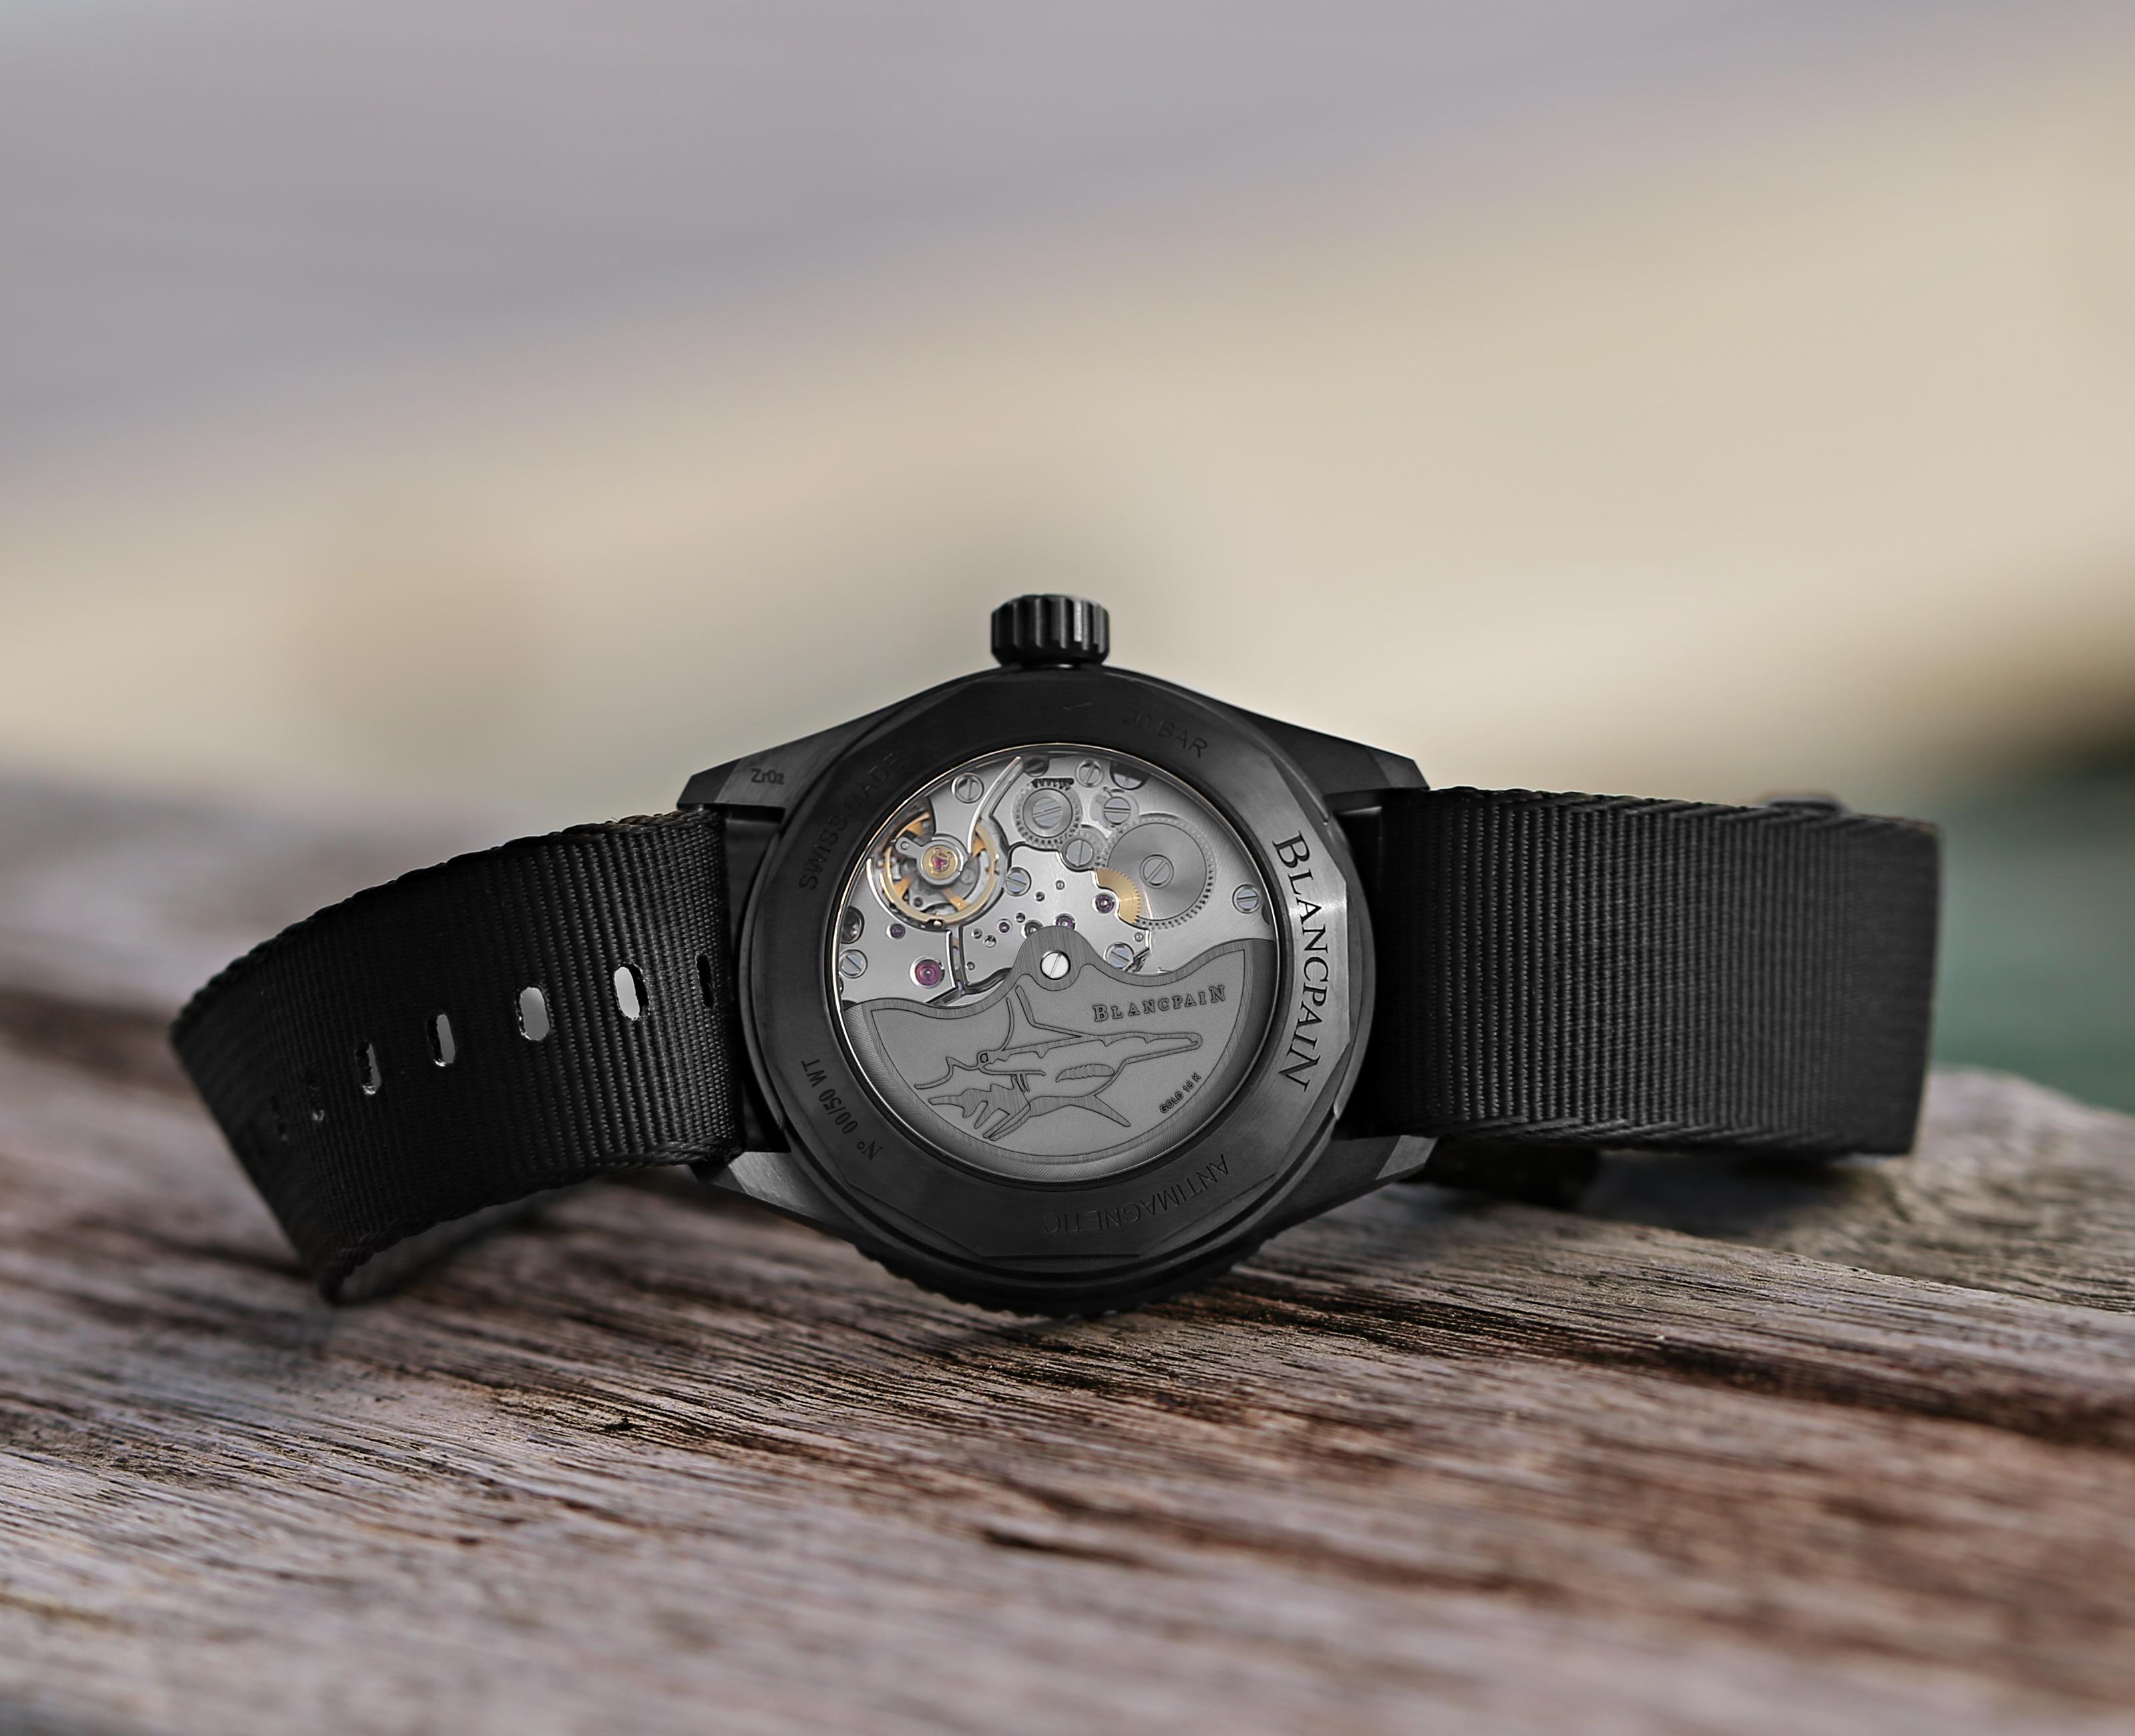 zegarek Blancpain